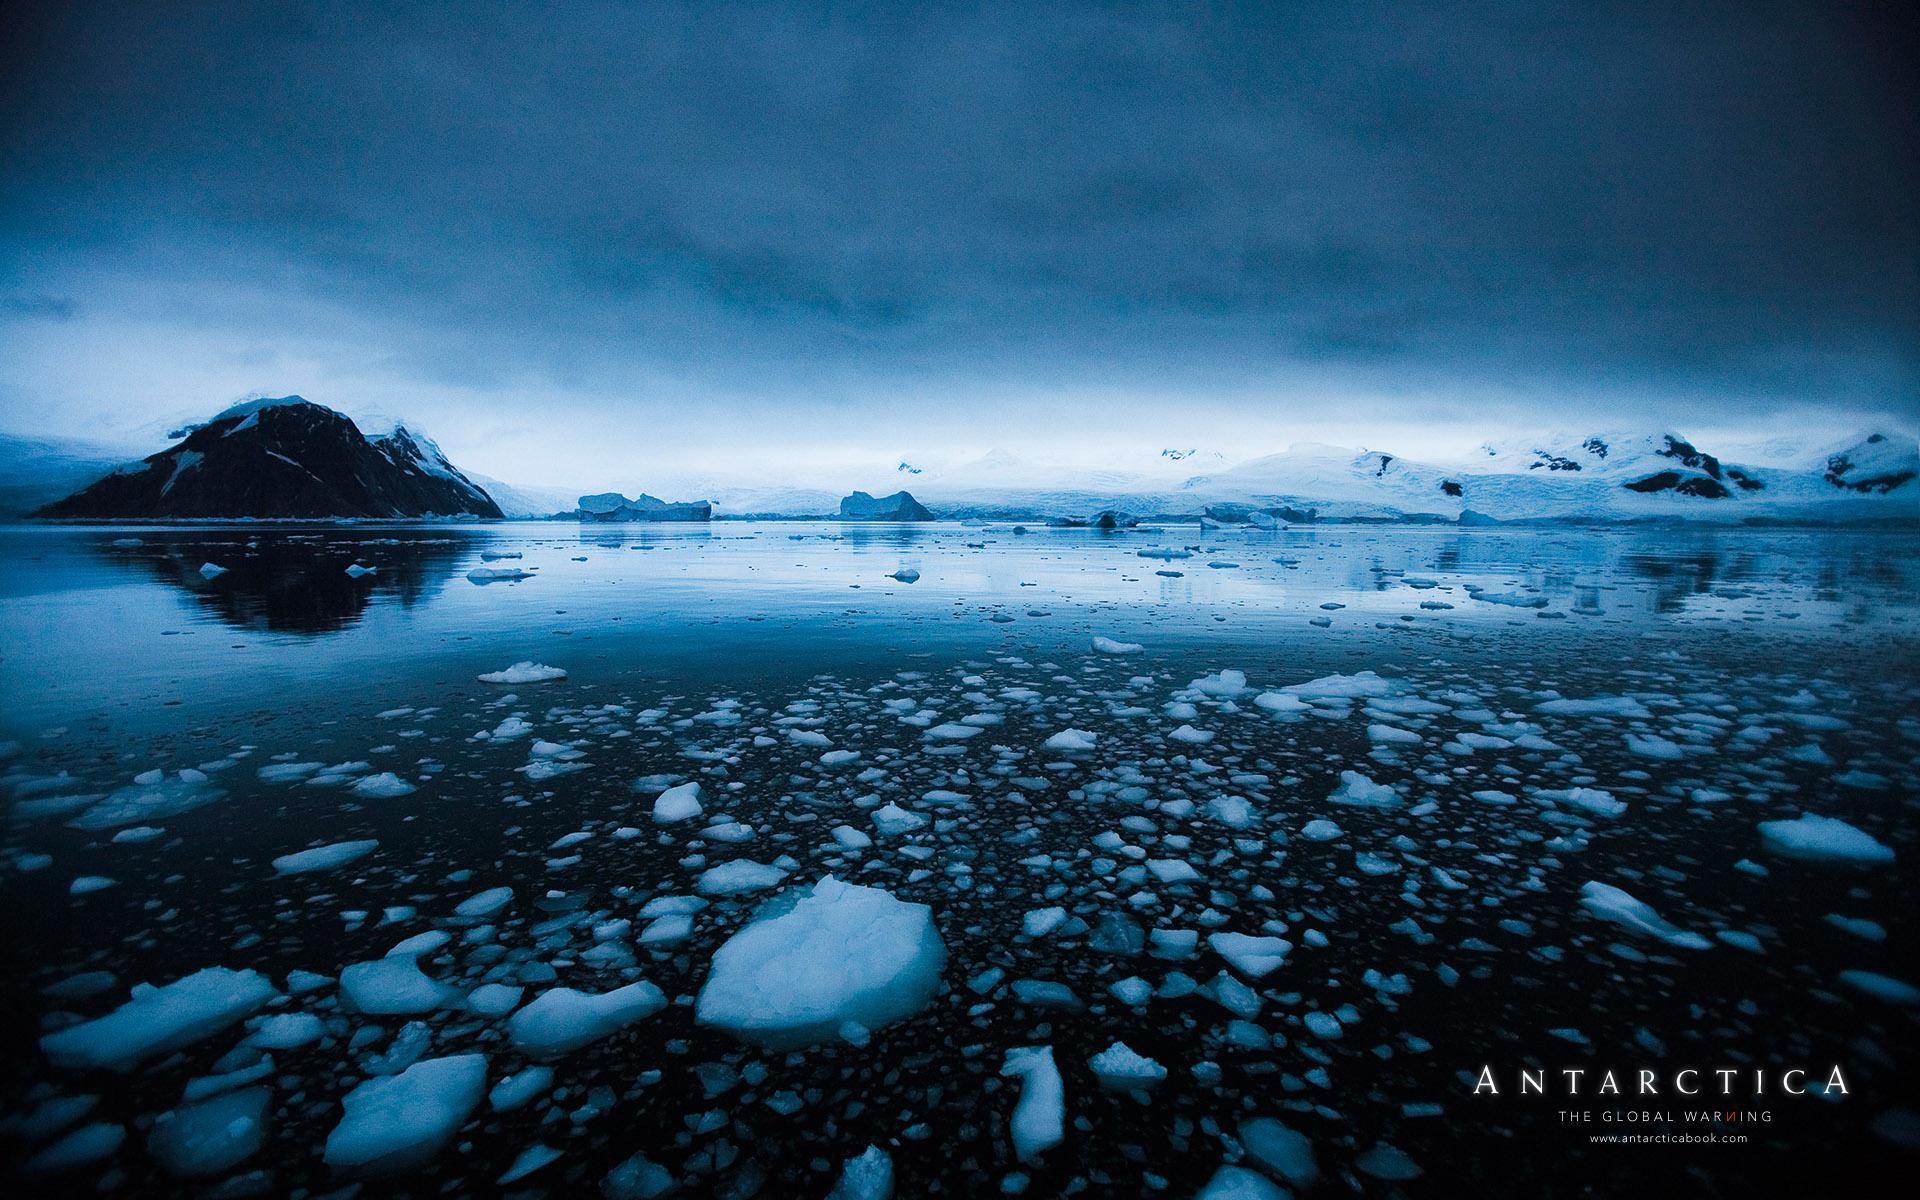 Antarctica HD Wallpaper Background Image 1920x1200 ID458233 1920x1200